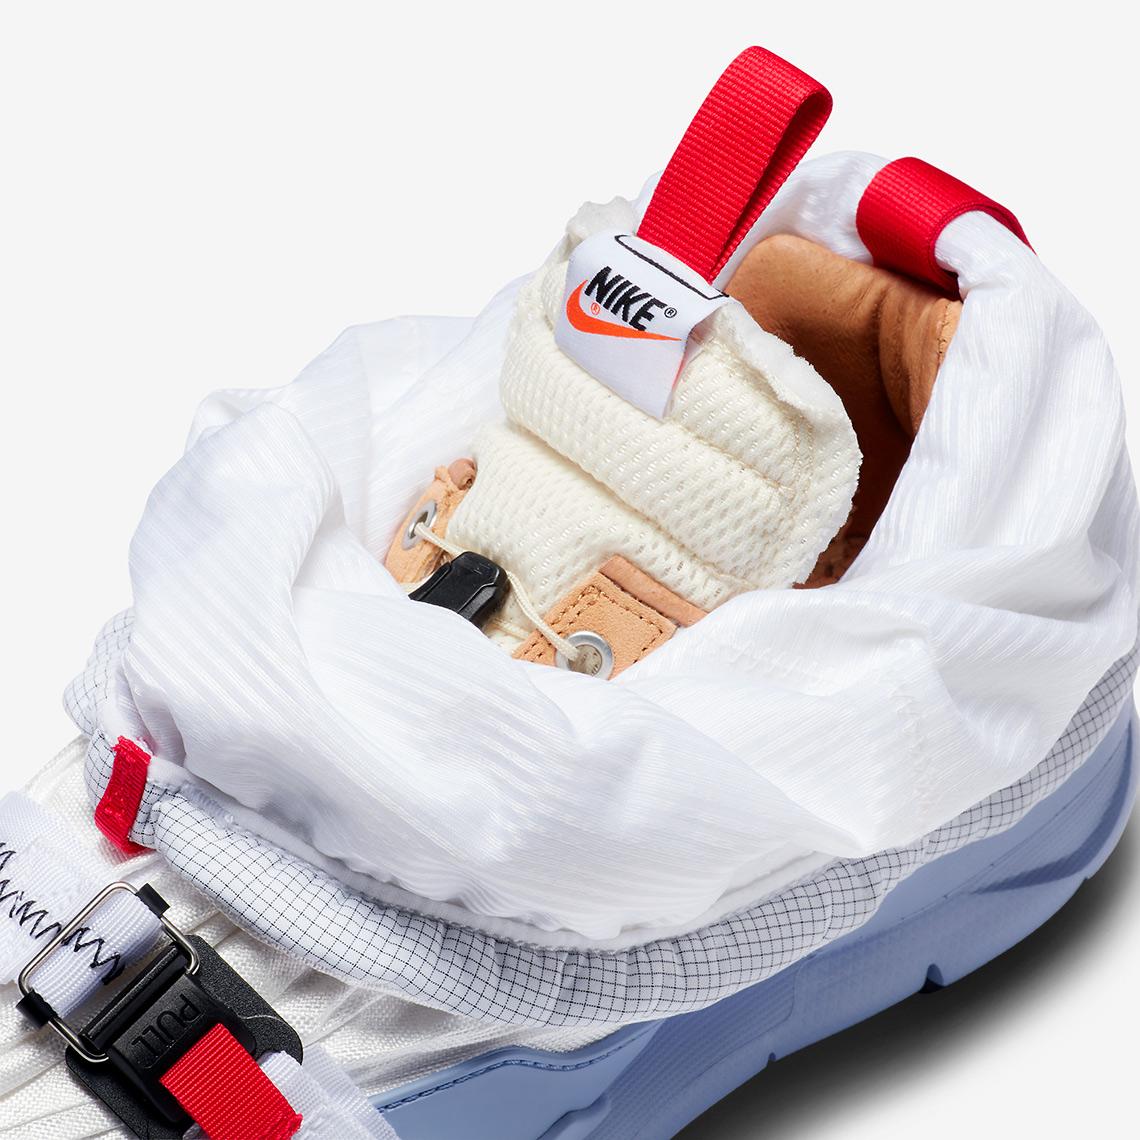 6d80e990318 Tom Sachs Nike Mars Yard Overshoe AH7767-101 Release